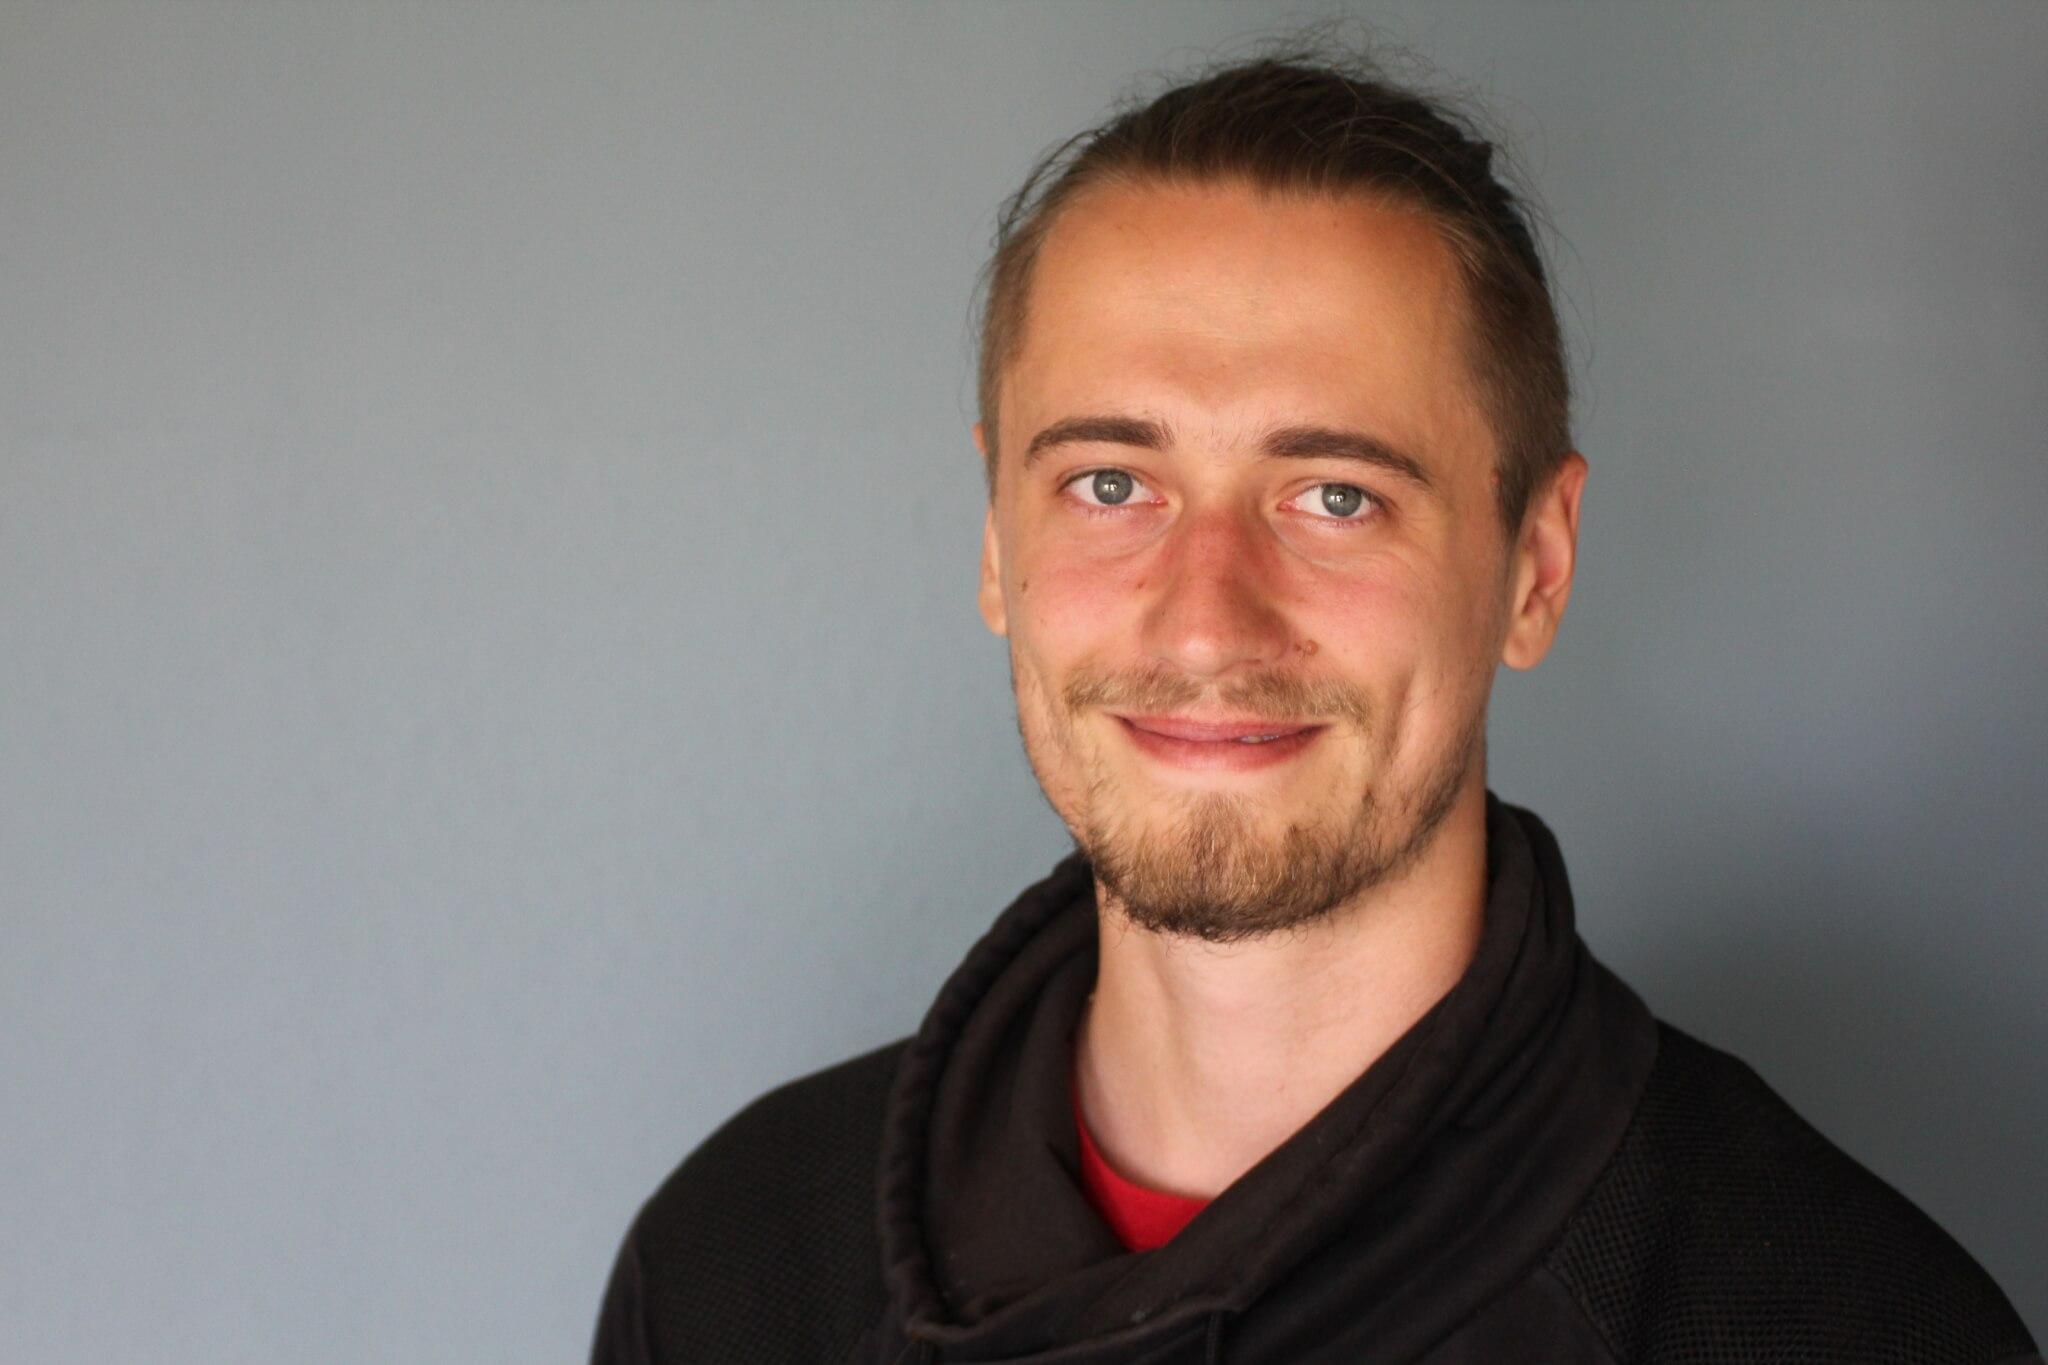 internat_kilian_kruschke